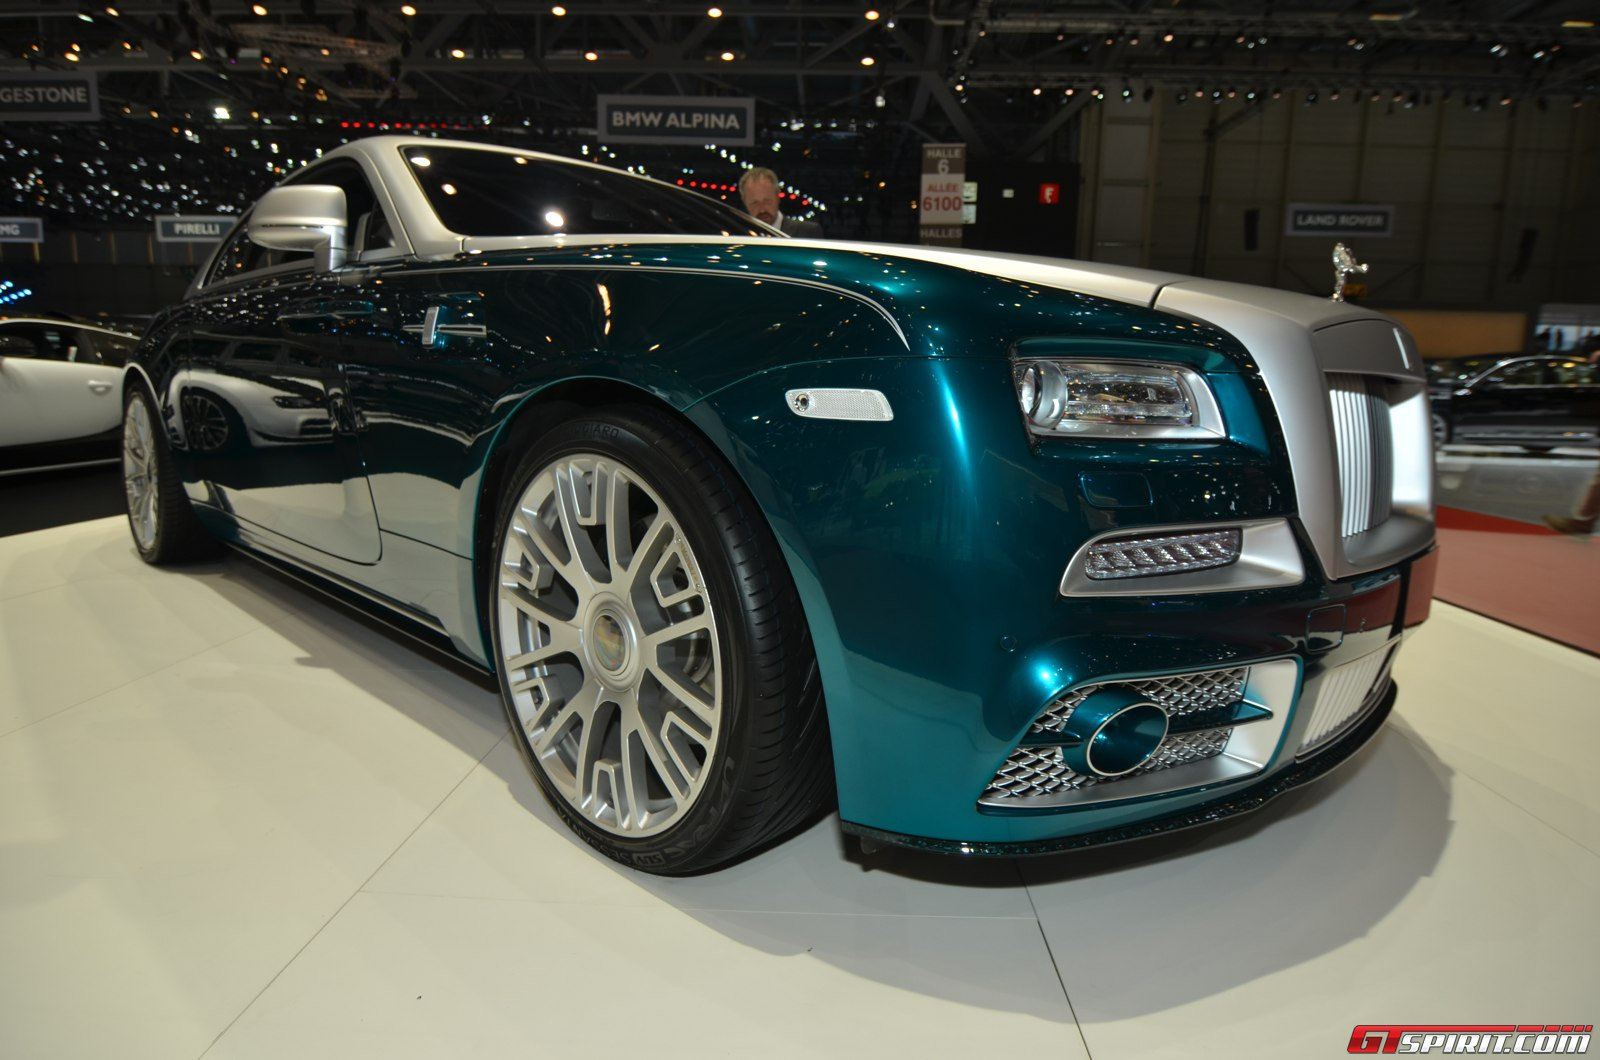 Mansory Rolls Royce Wraith at the Geneva Motor Show 2014